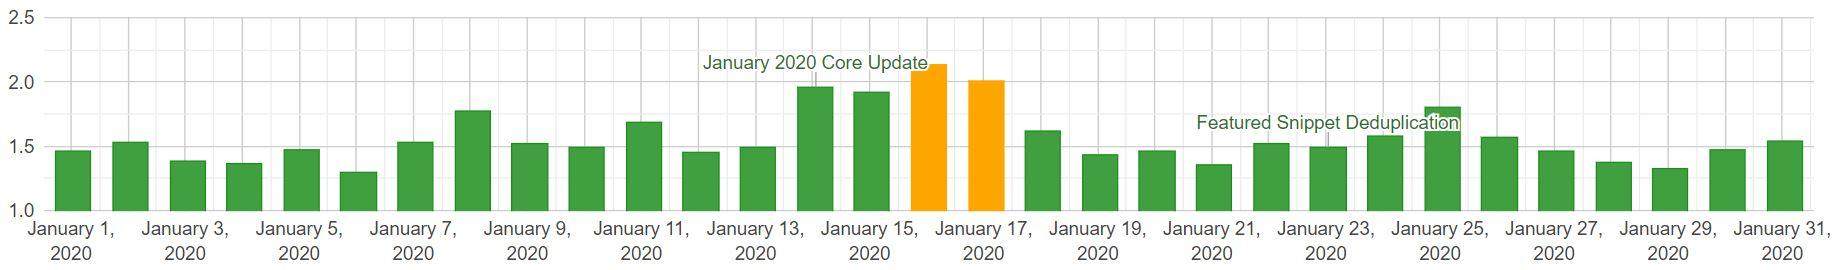 SERP changes mobile styczeń 2020